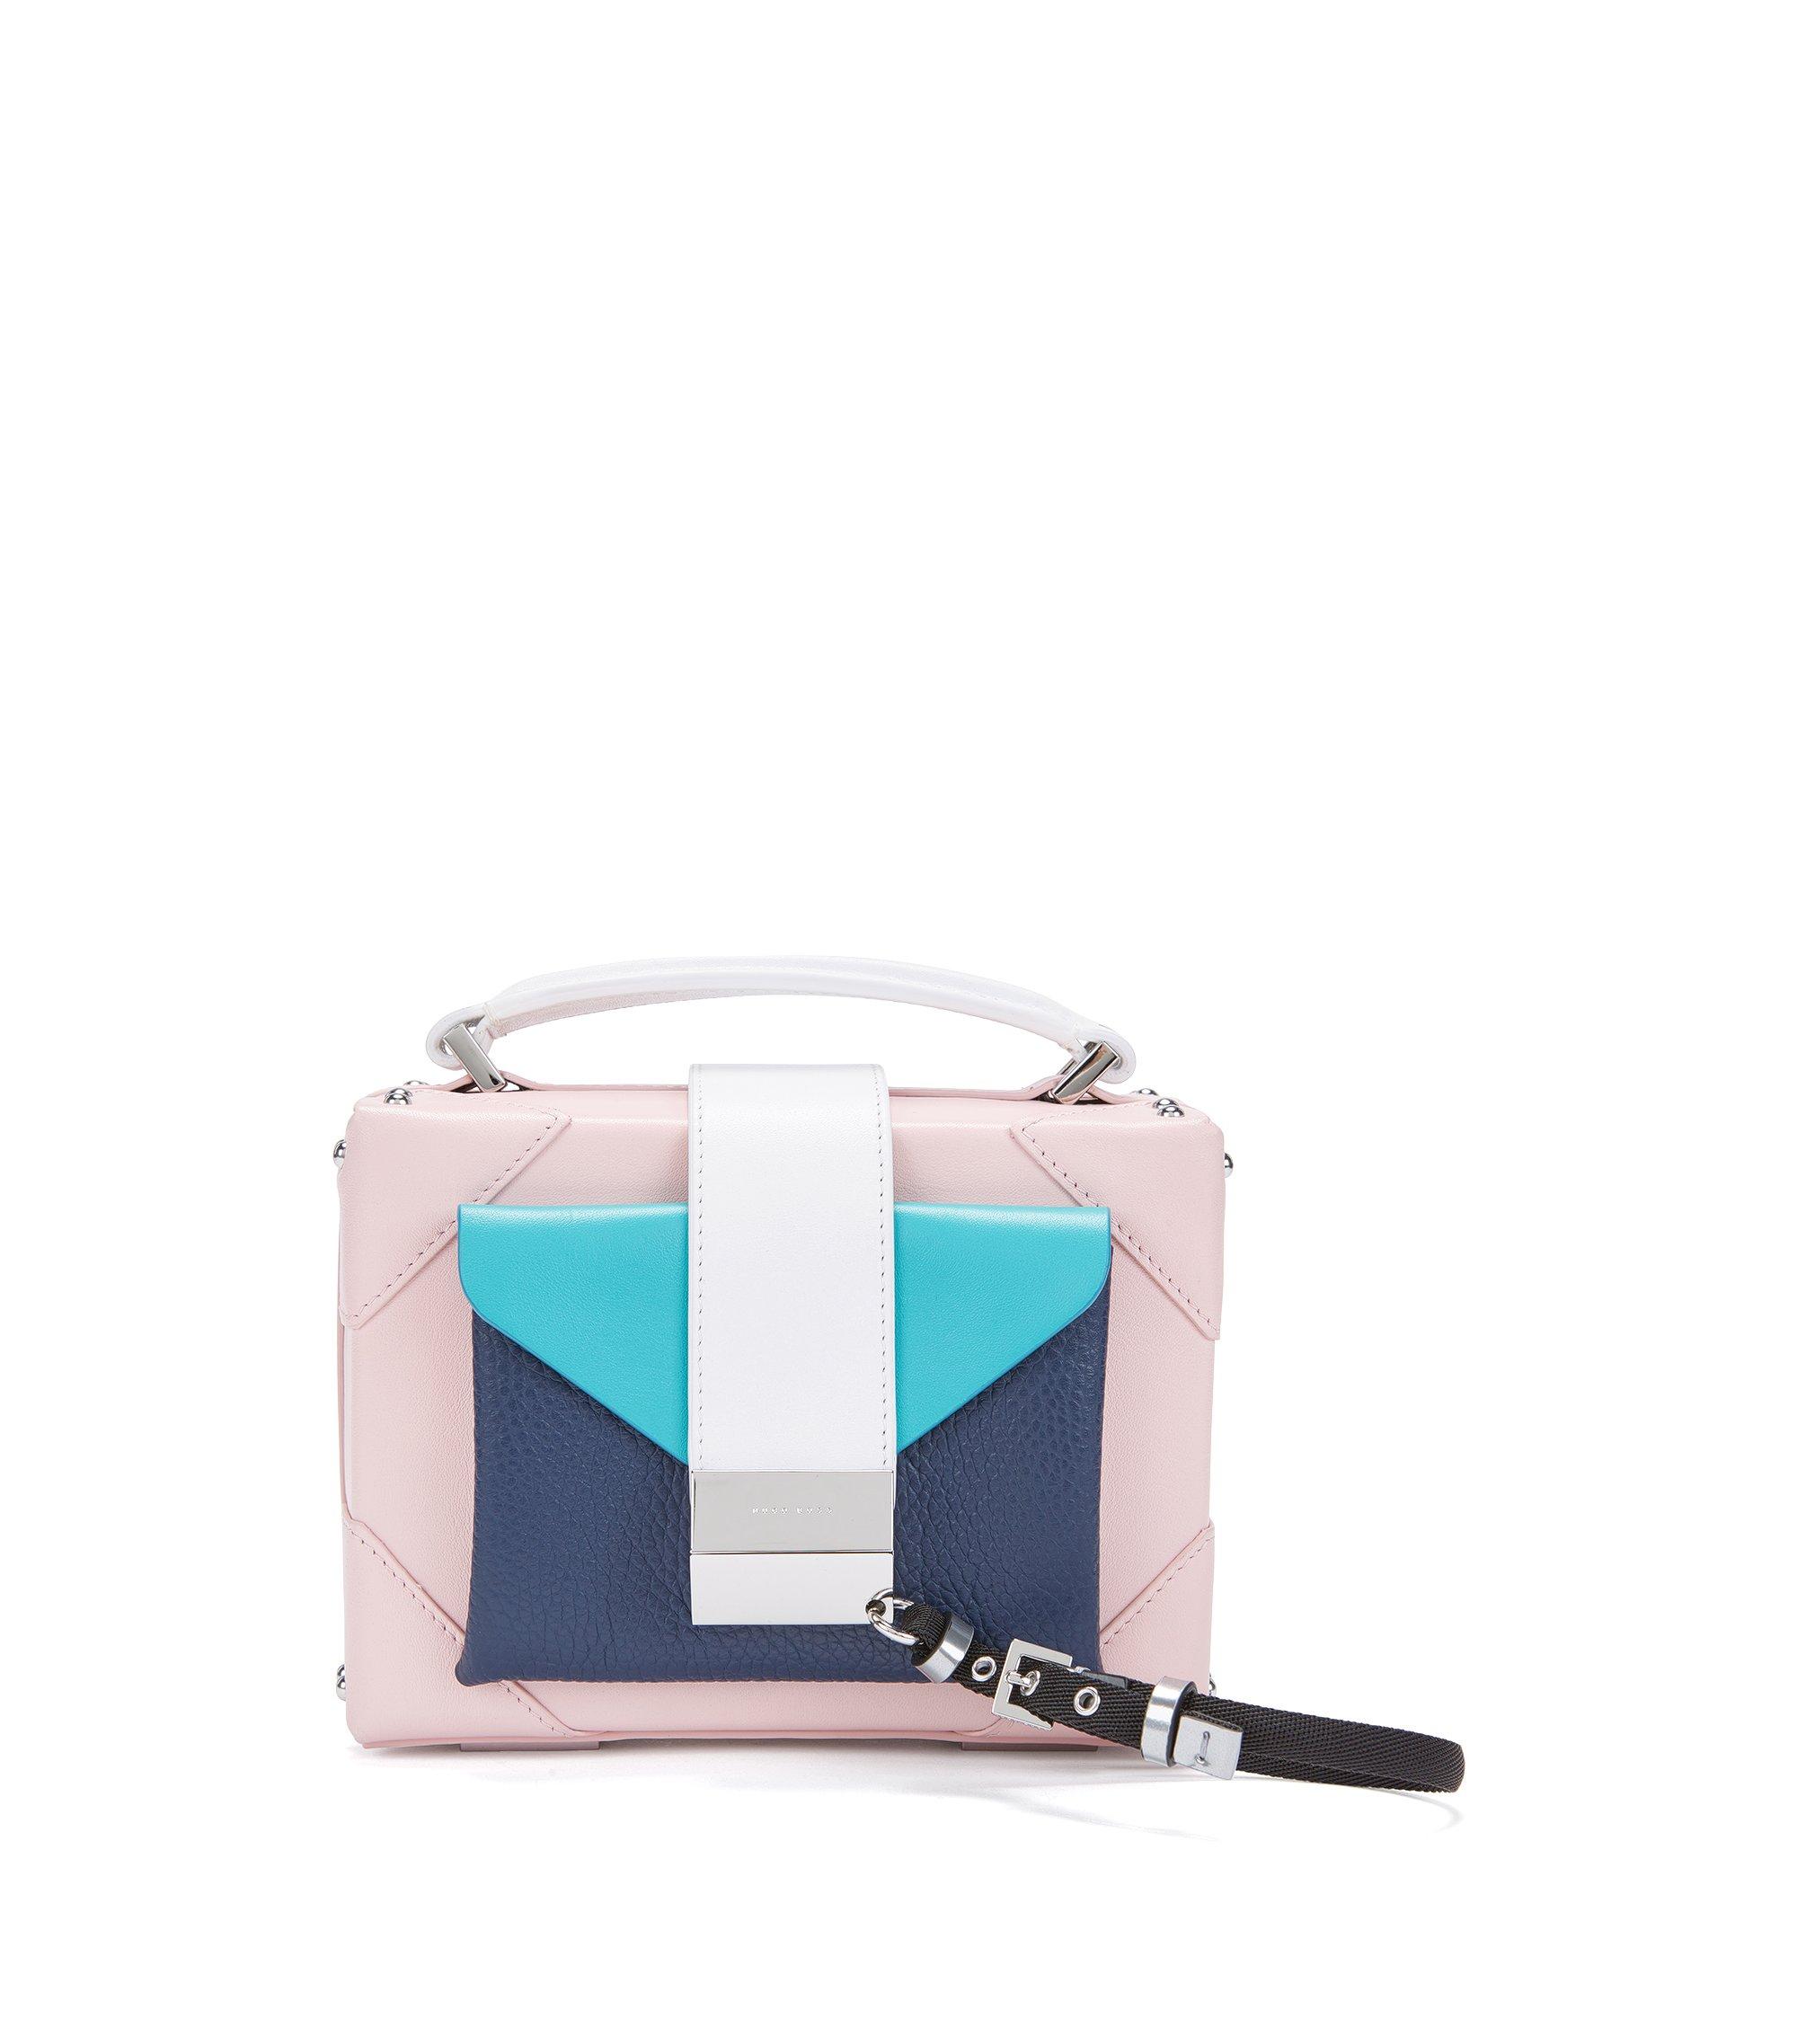 Gallery Collection Leather Shoulder Bag | Lexi Sh. Bag GC , light pink